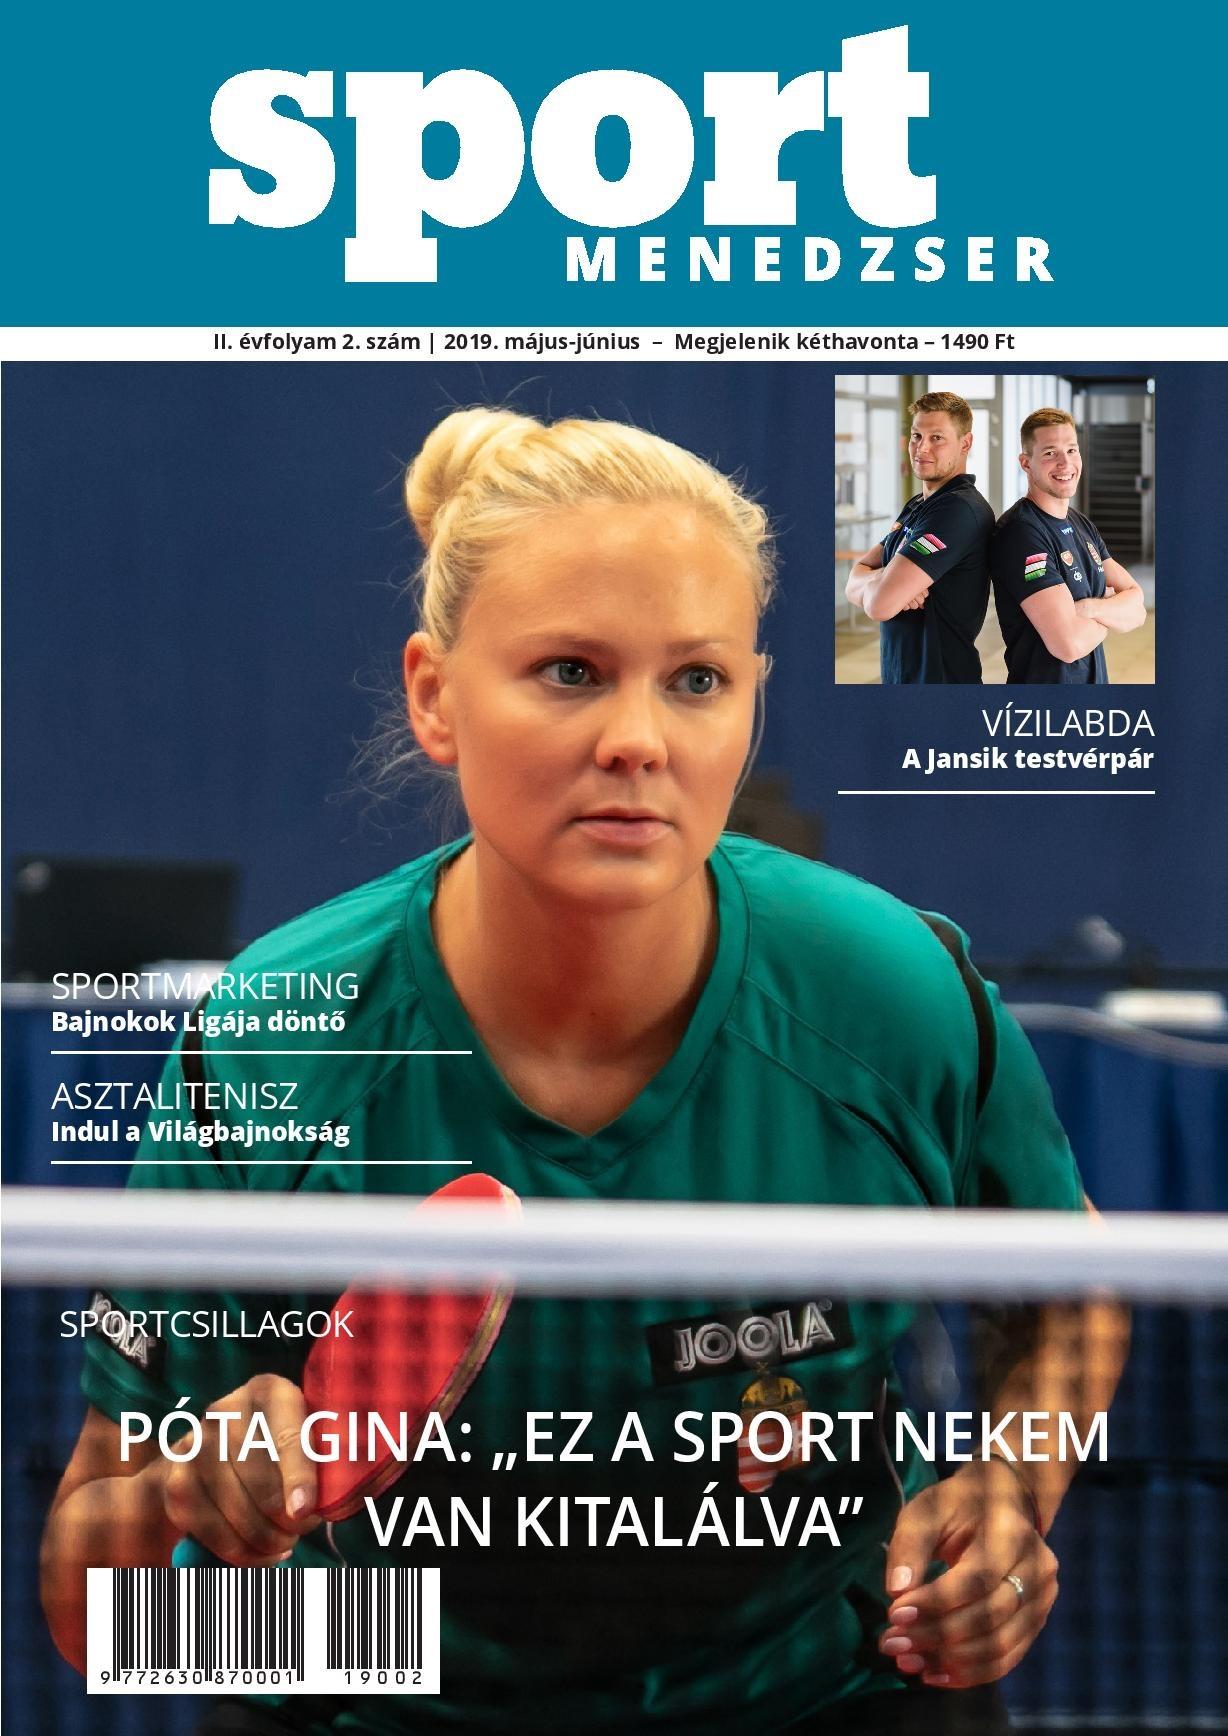 SportMenedzser Magazin - II. évf -2. sz